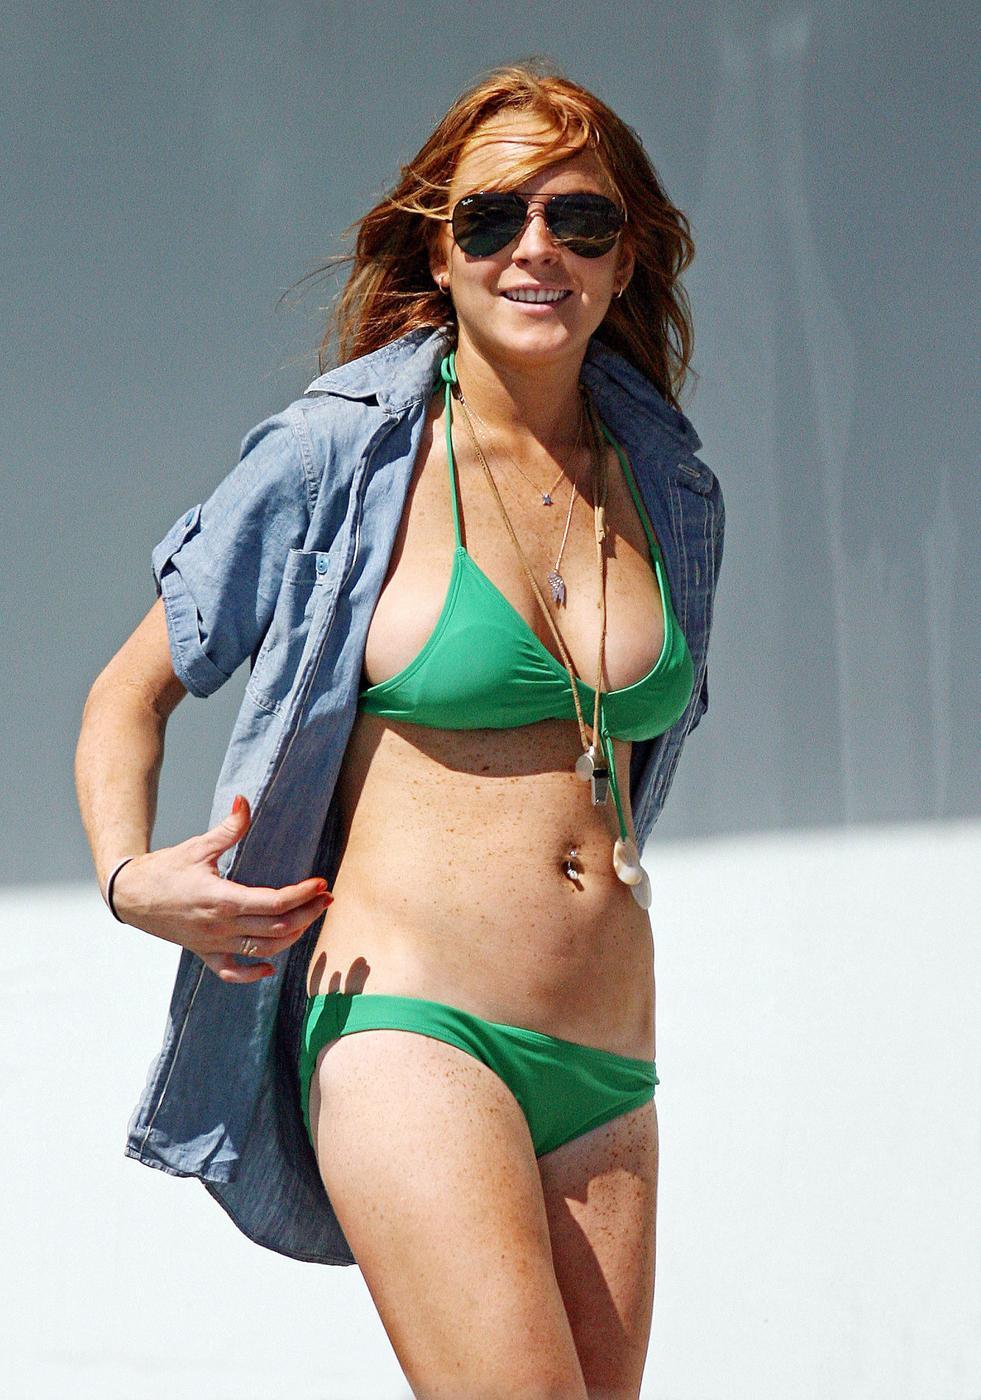 lindsay lohan green bikini